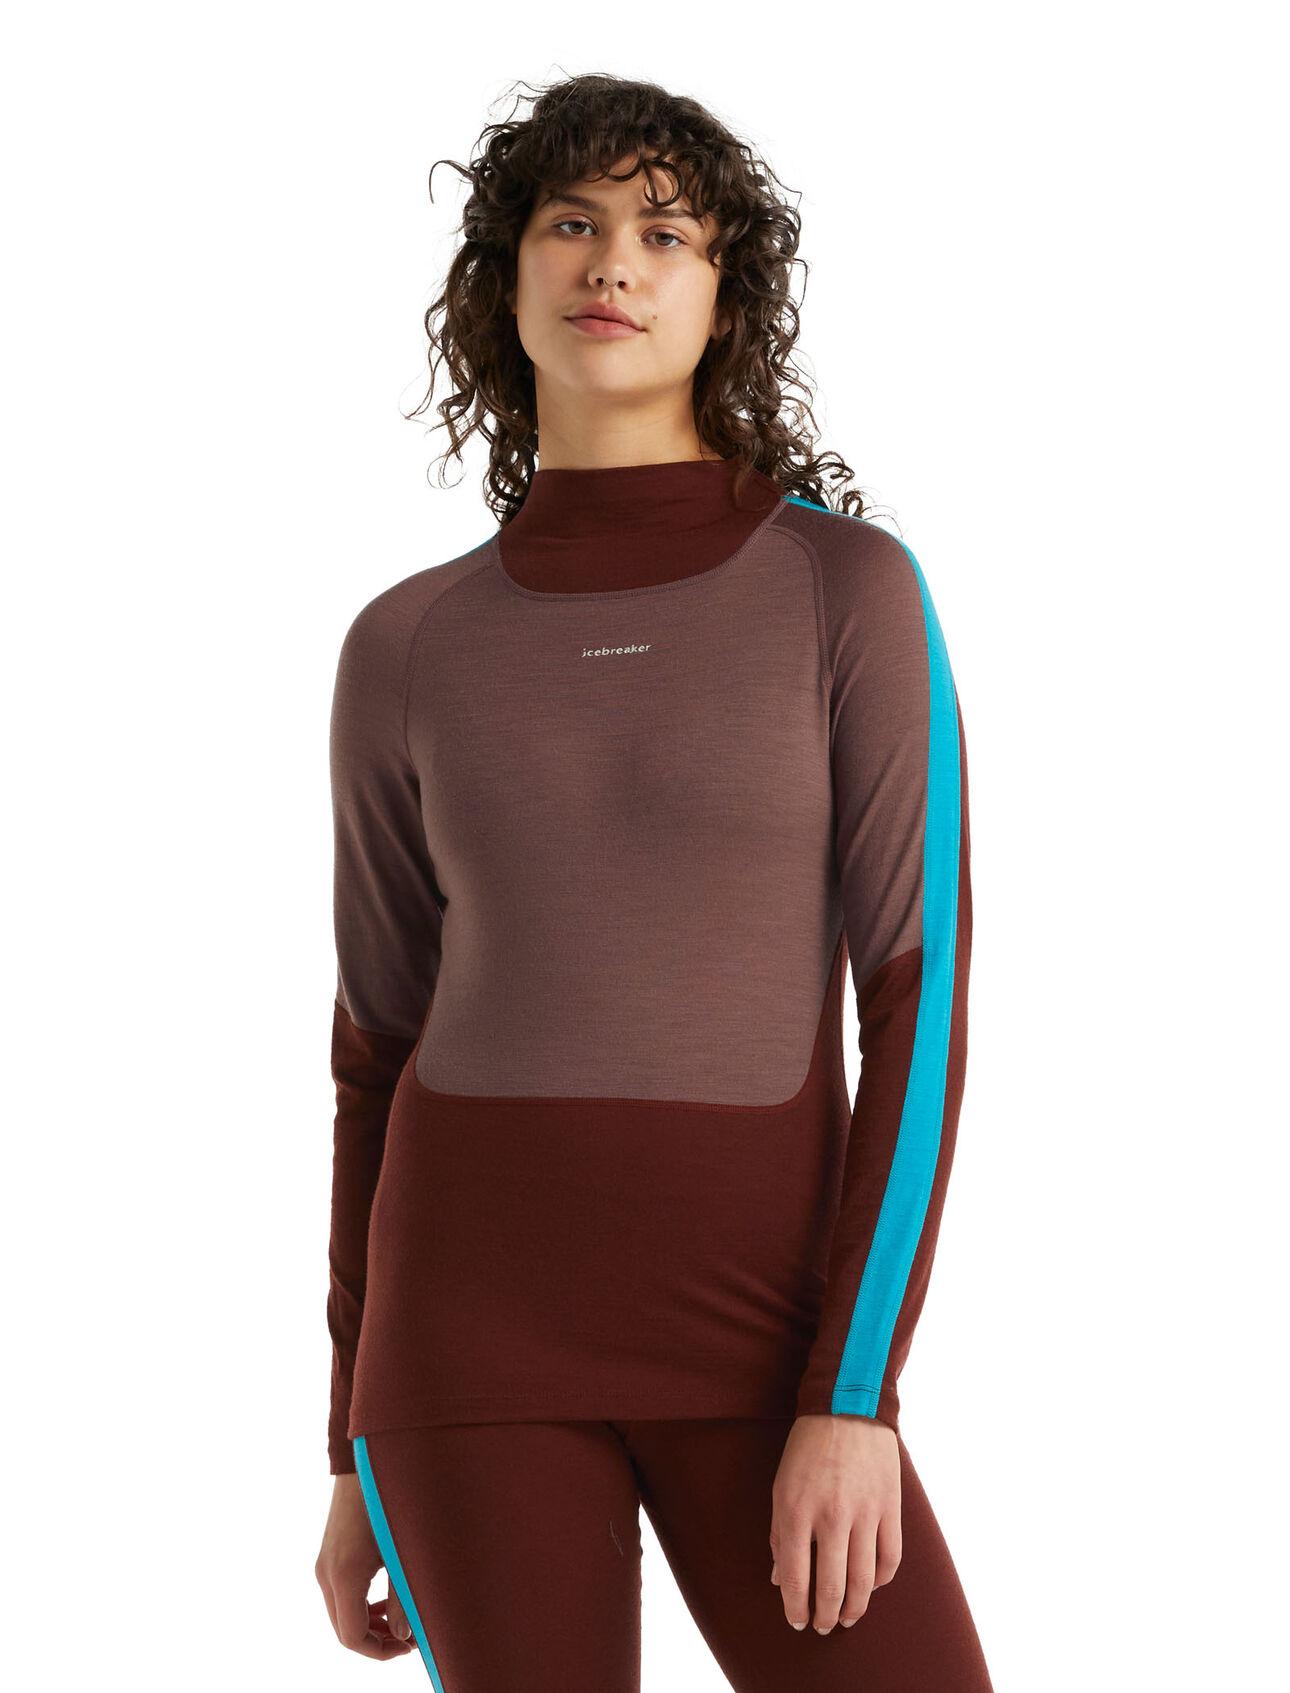 Merino 200 Sonebula Long Sleeve High Neck Thermal Top